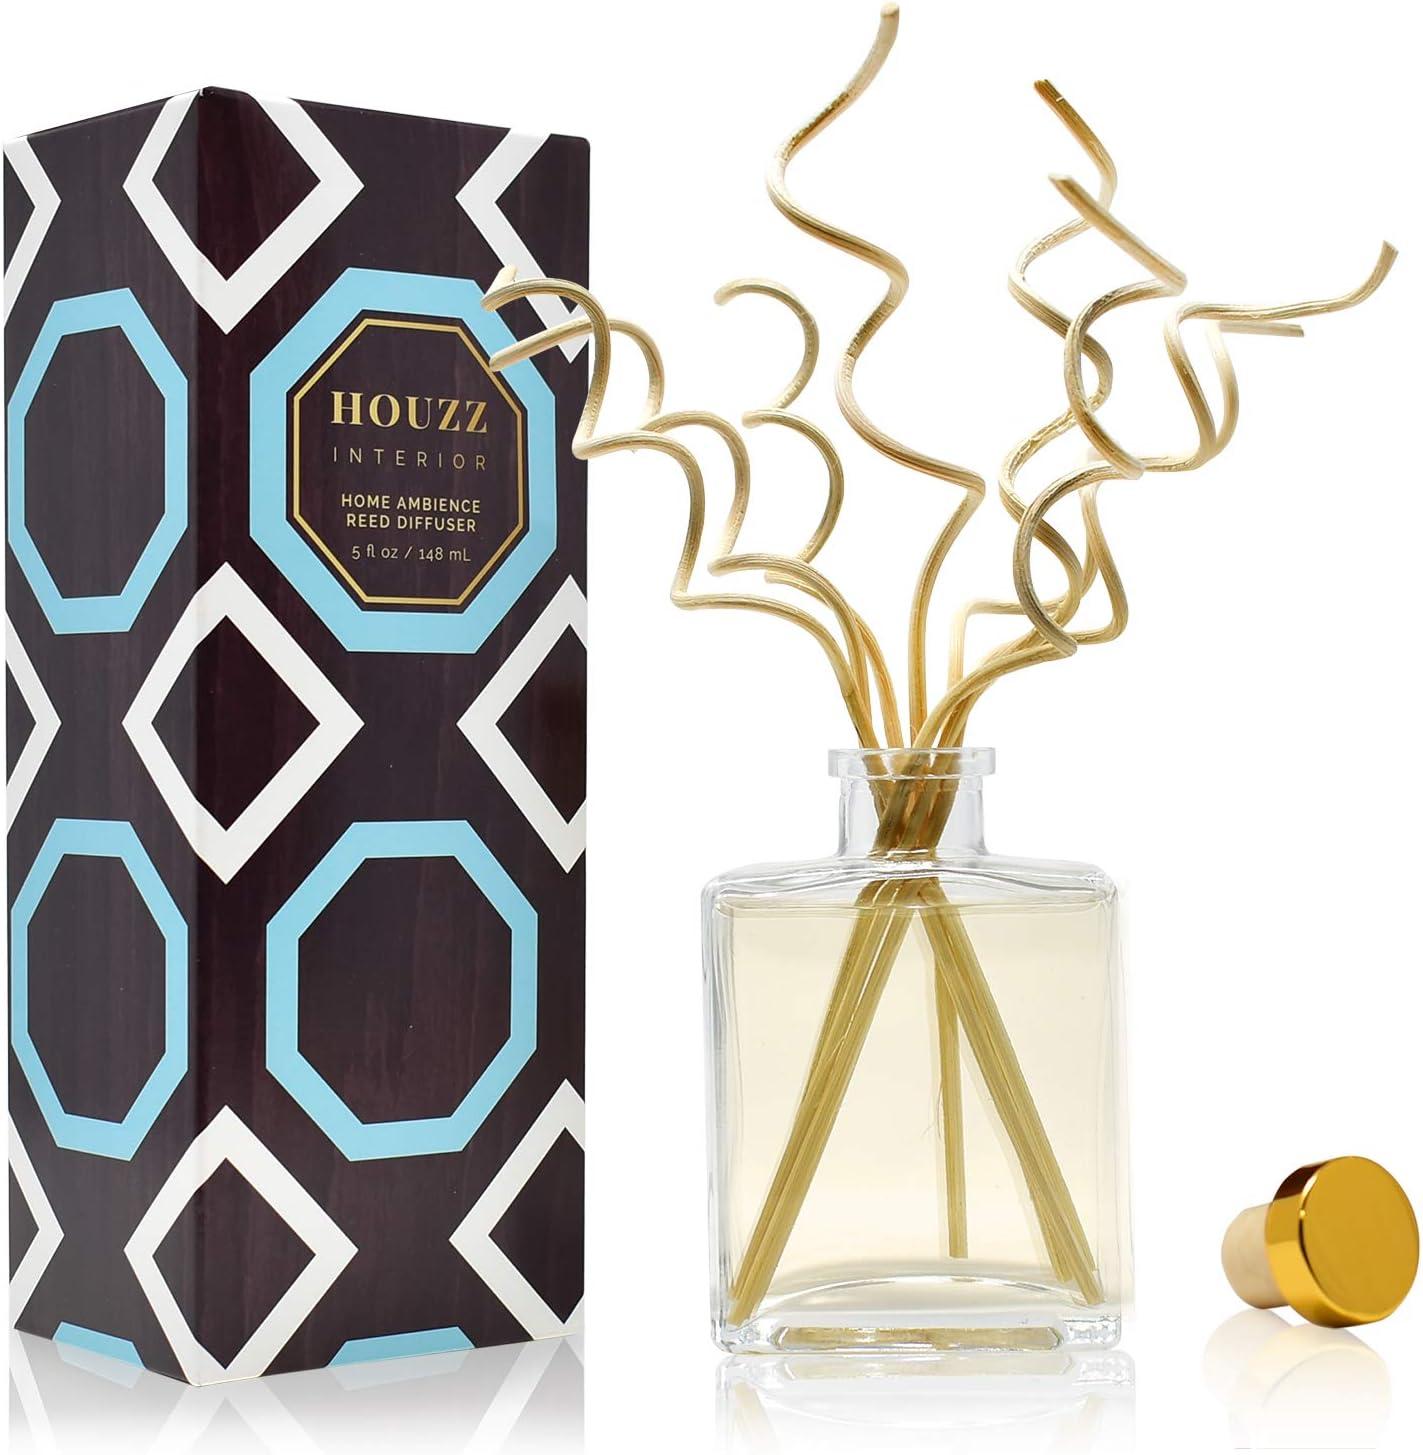 HOUZZ Interior Lemon Verbena Essential Oil Reed Diffuser | Lemon Zest & Verbena Blossoms Blended with Vetiver & Natural Lemongrass | Great Housewarming Gift Idea!